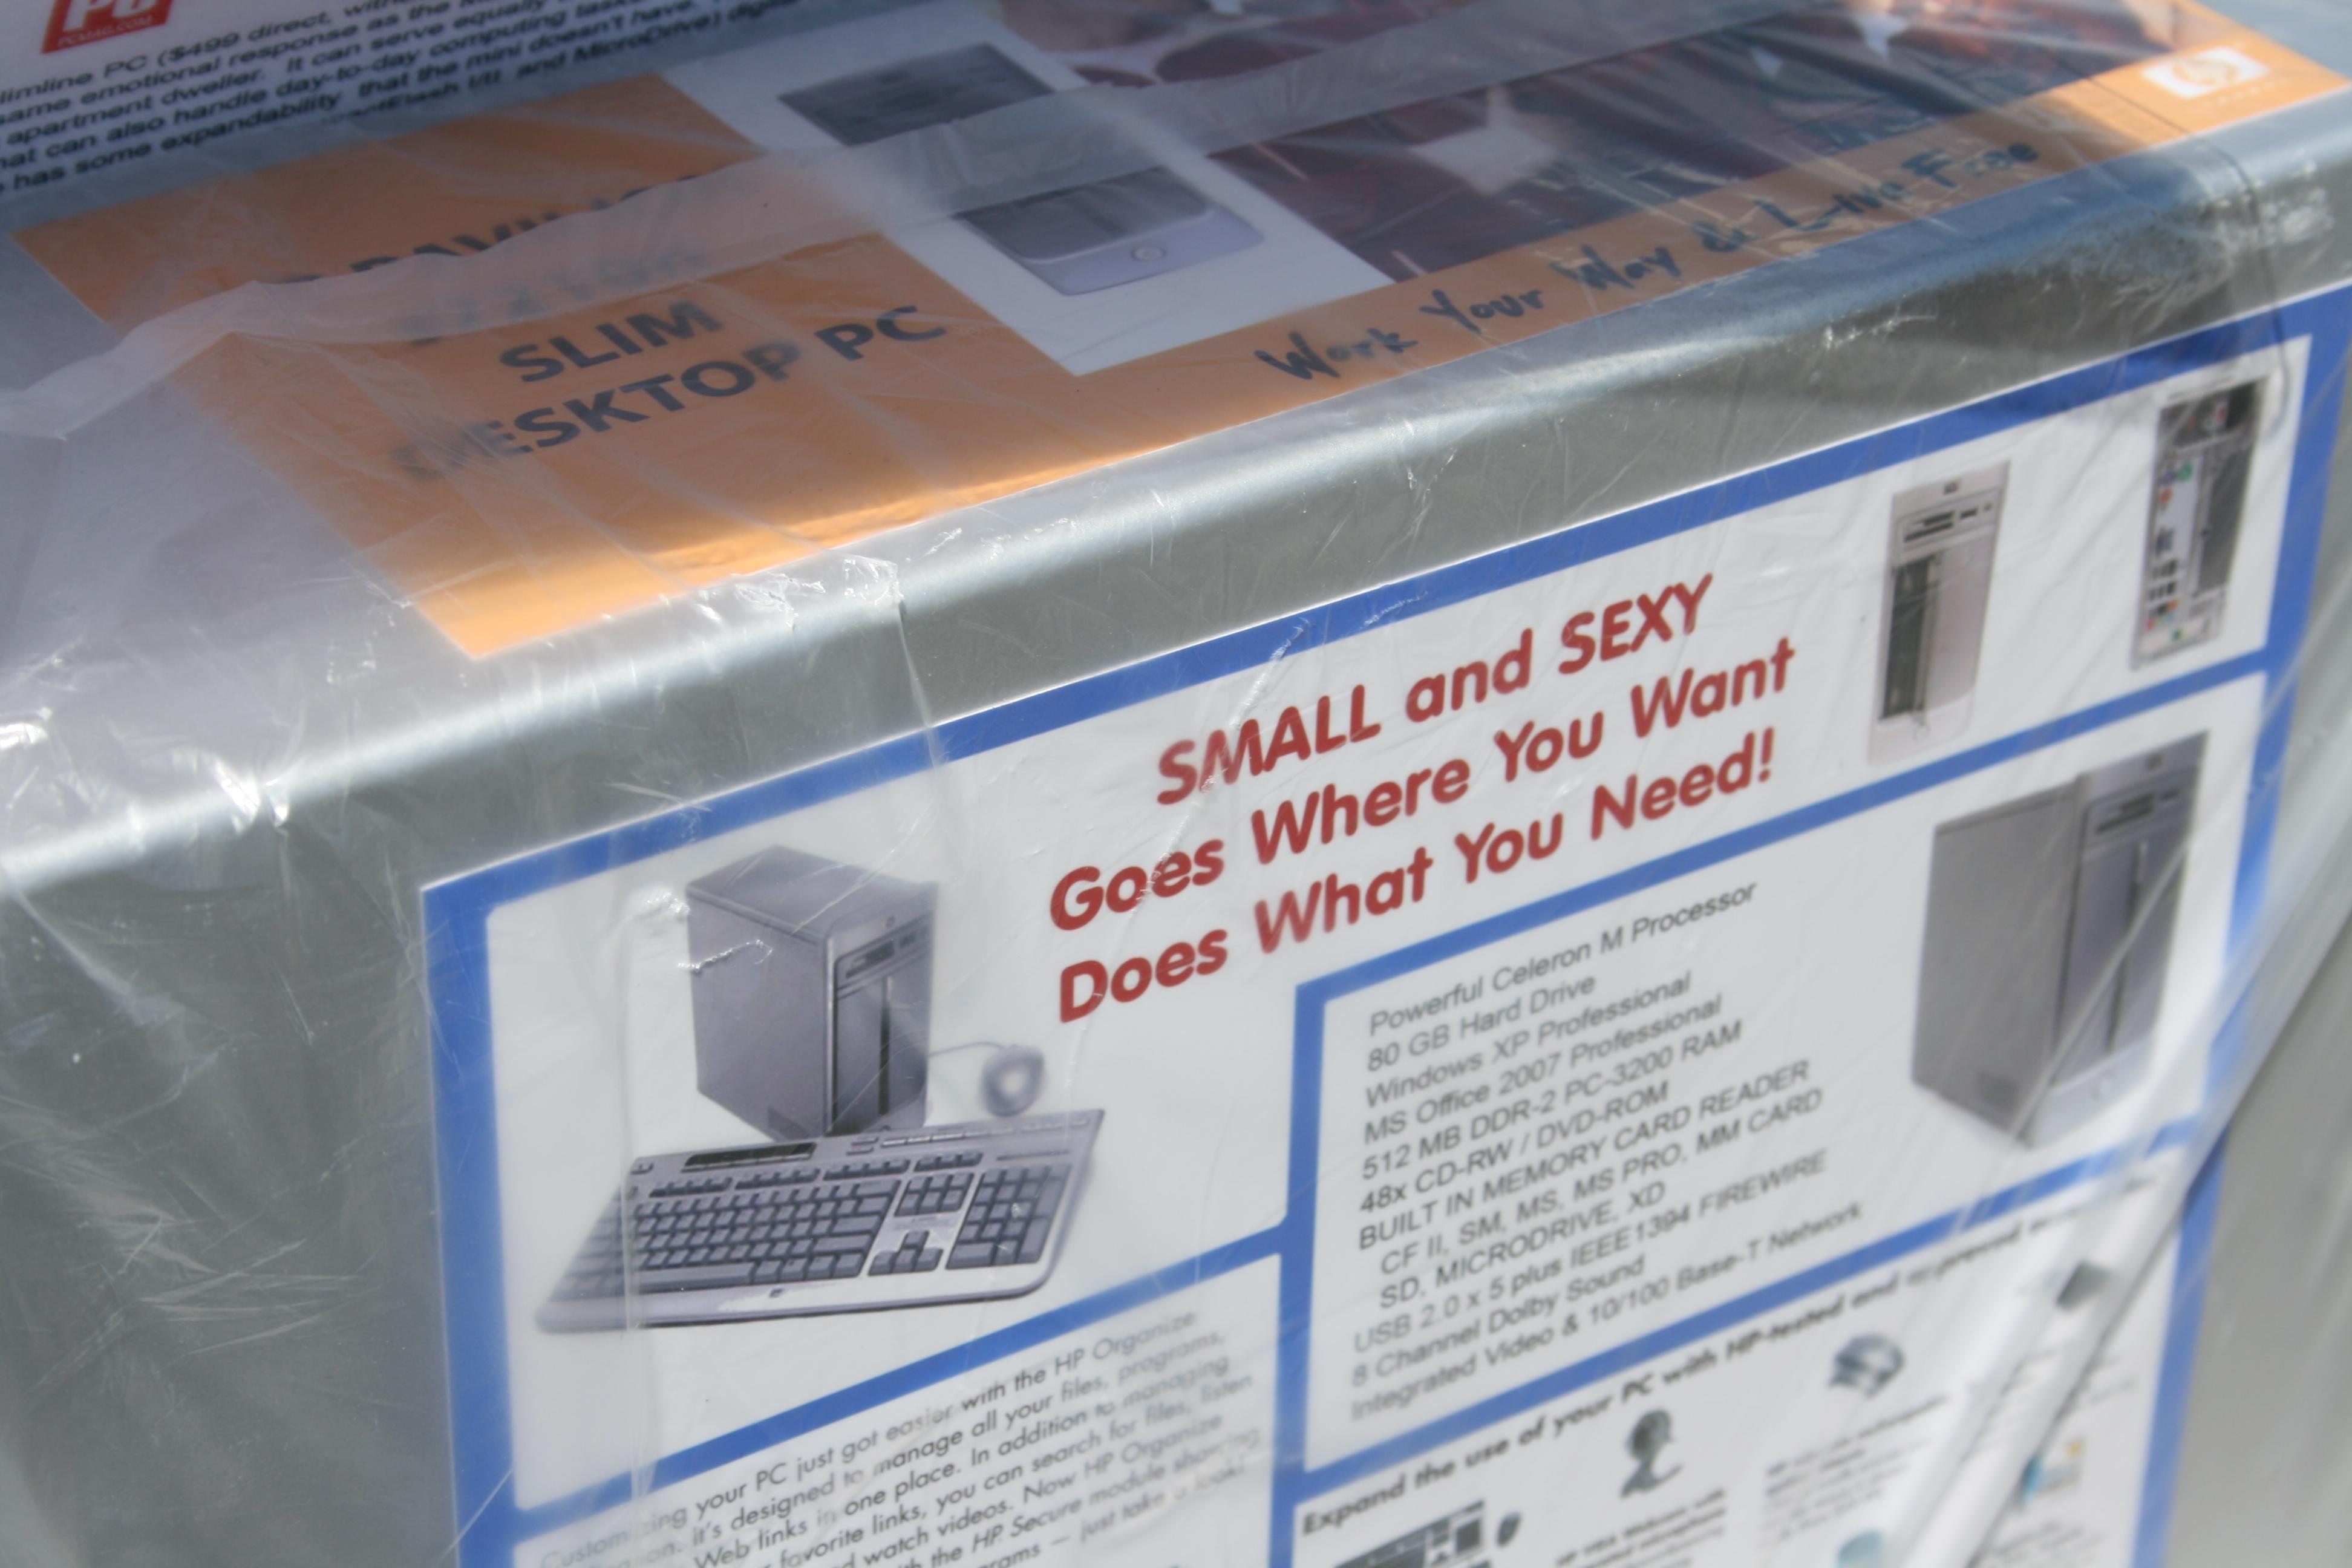 http://pushbutt.com/pushbutt/bradalex-smallsexy.JPG